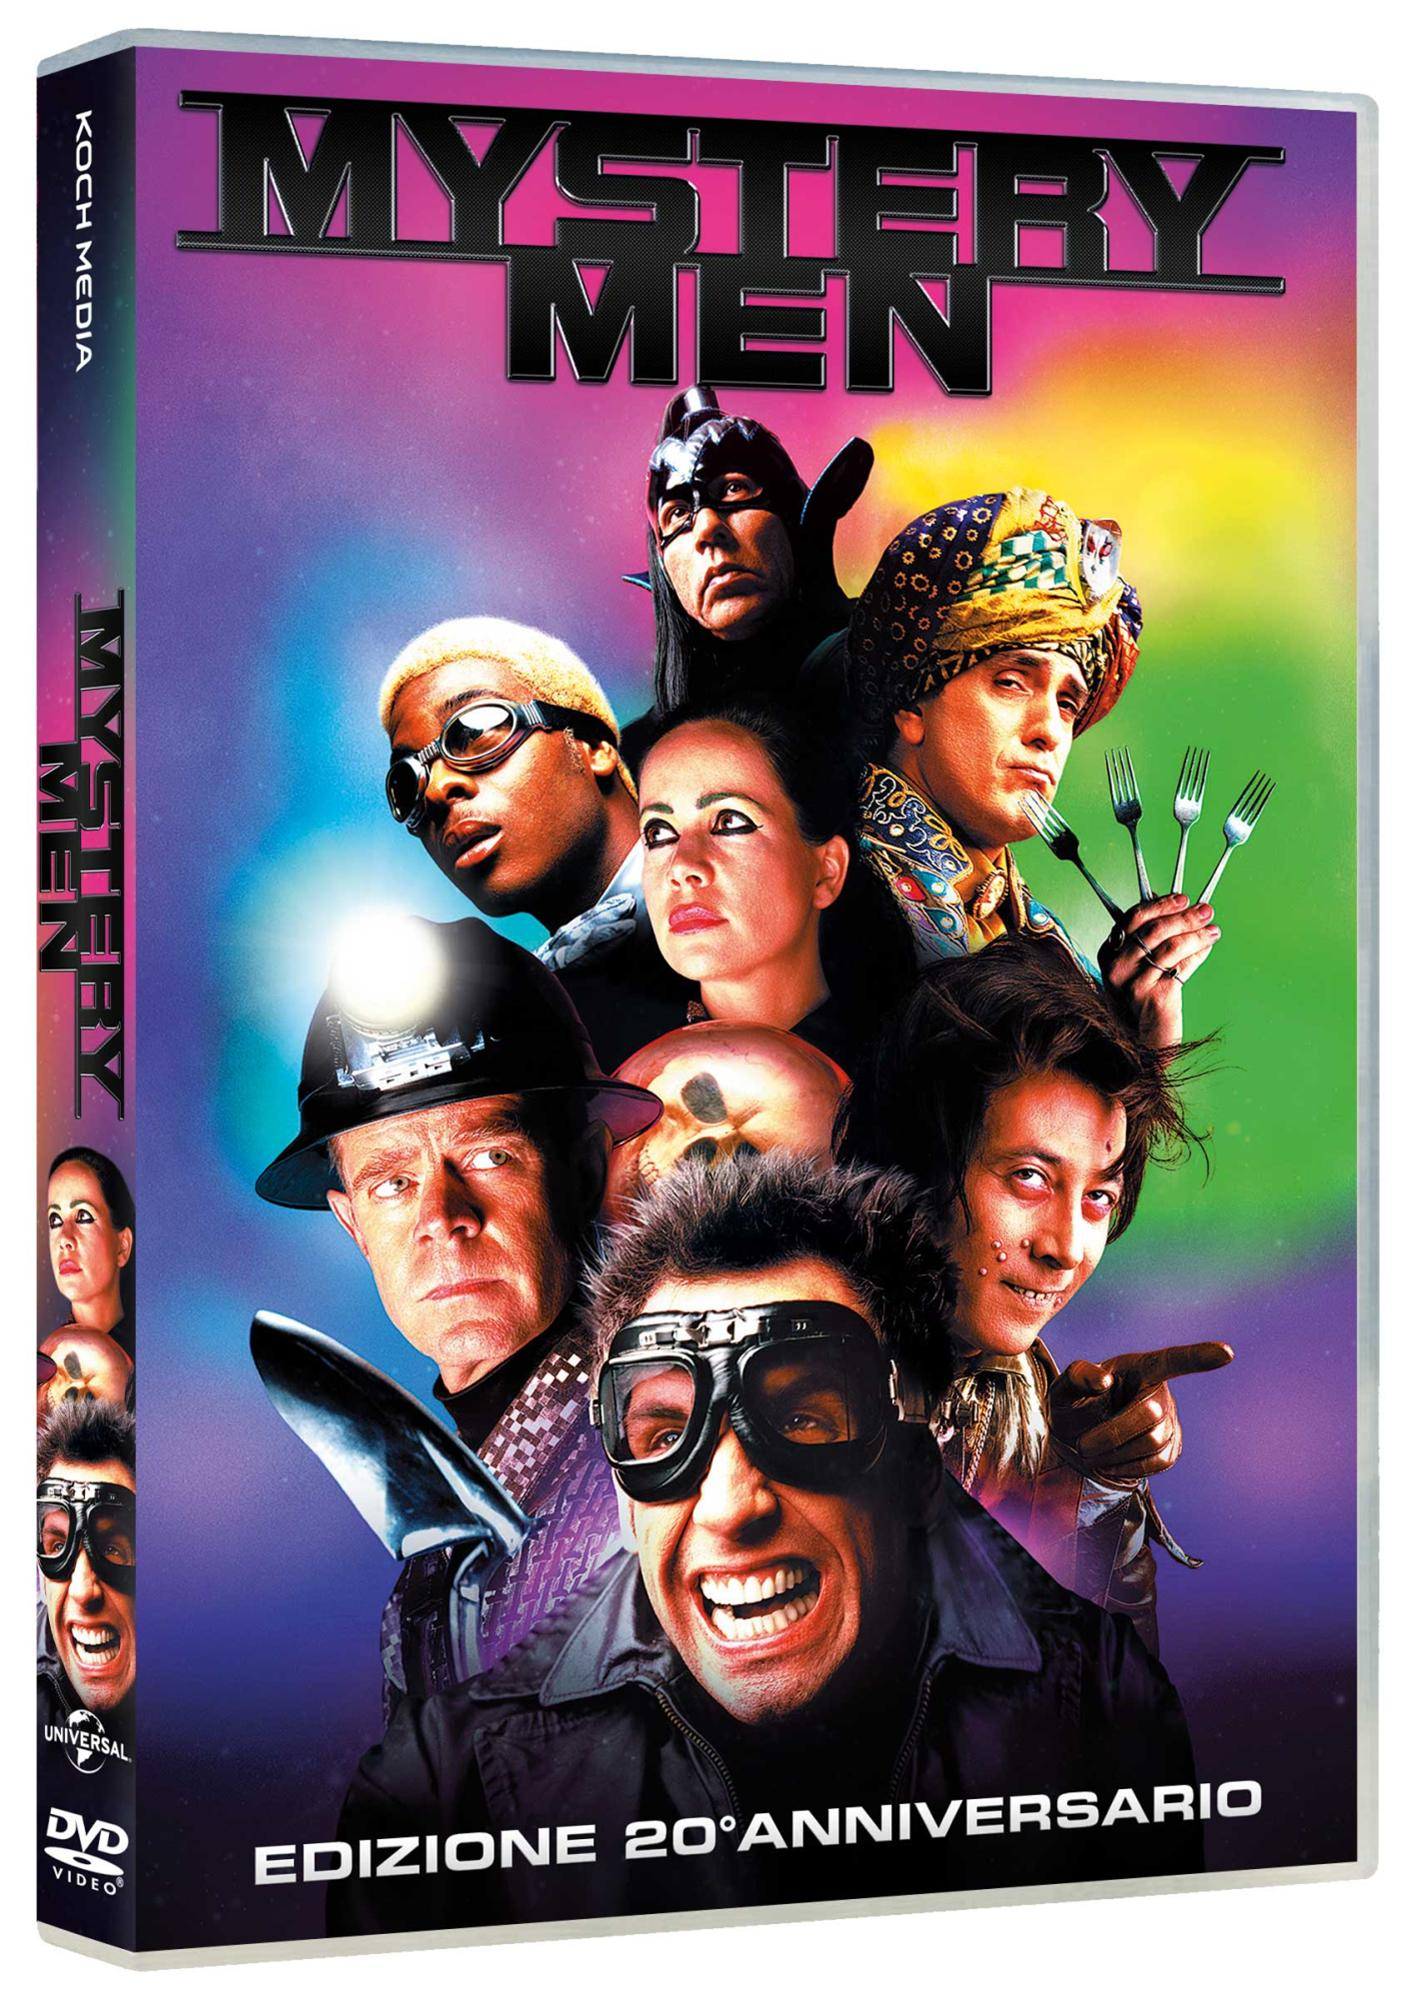 MYSTERY MEN (DVD)